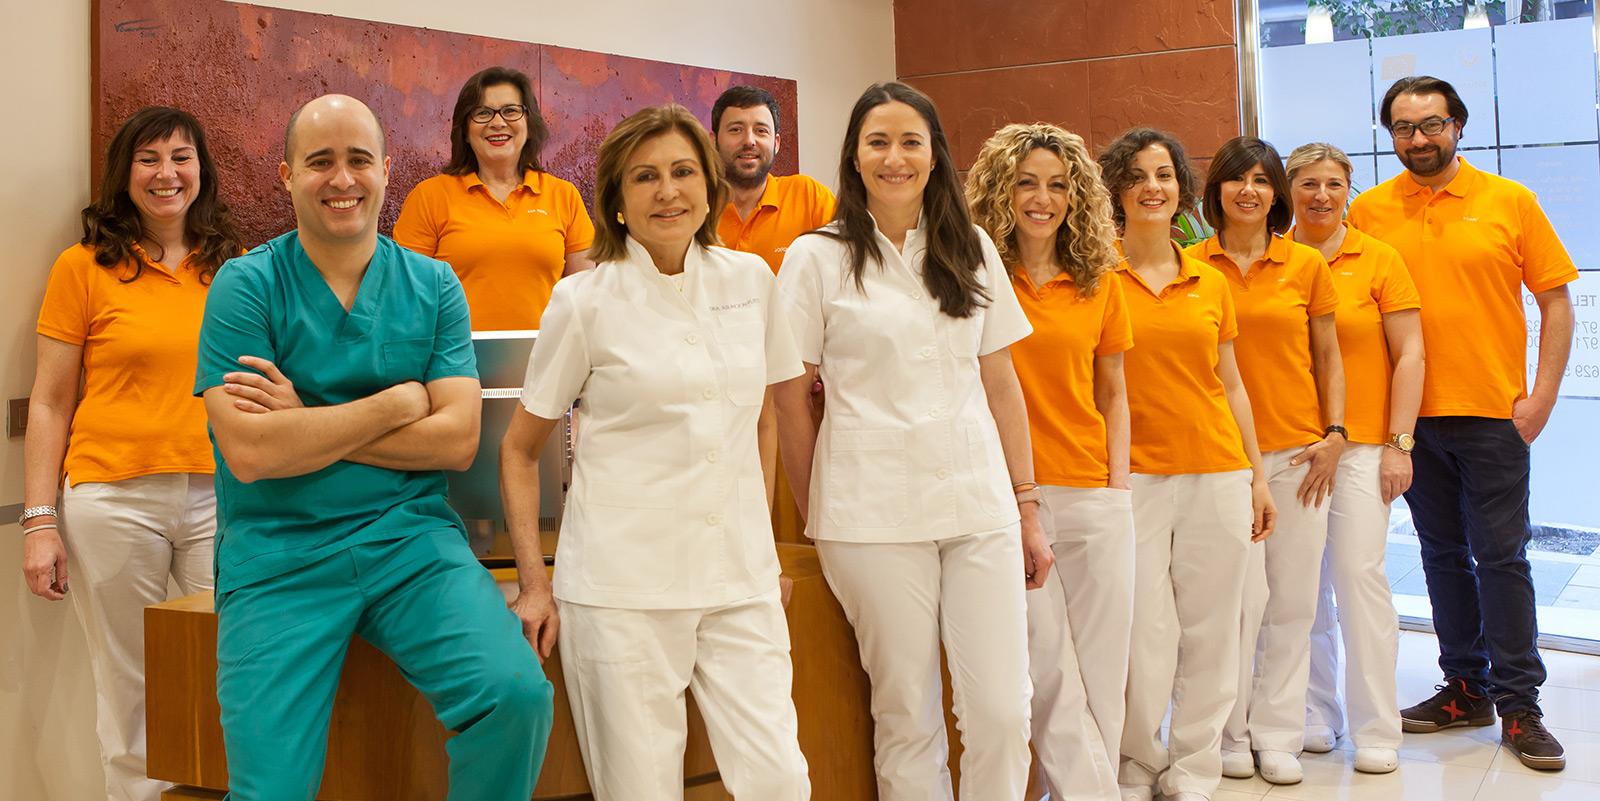 equipo_portada_clinica_dental_fuste2016